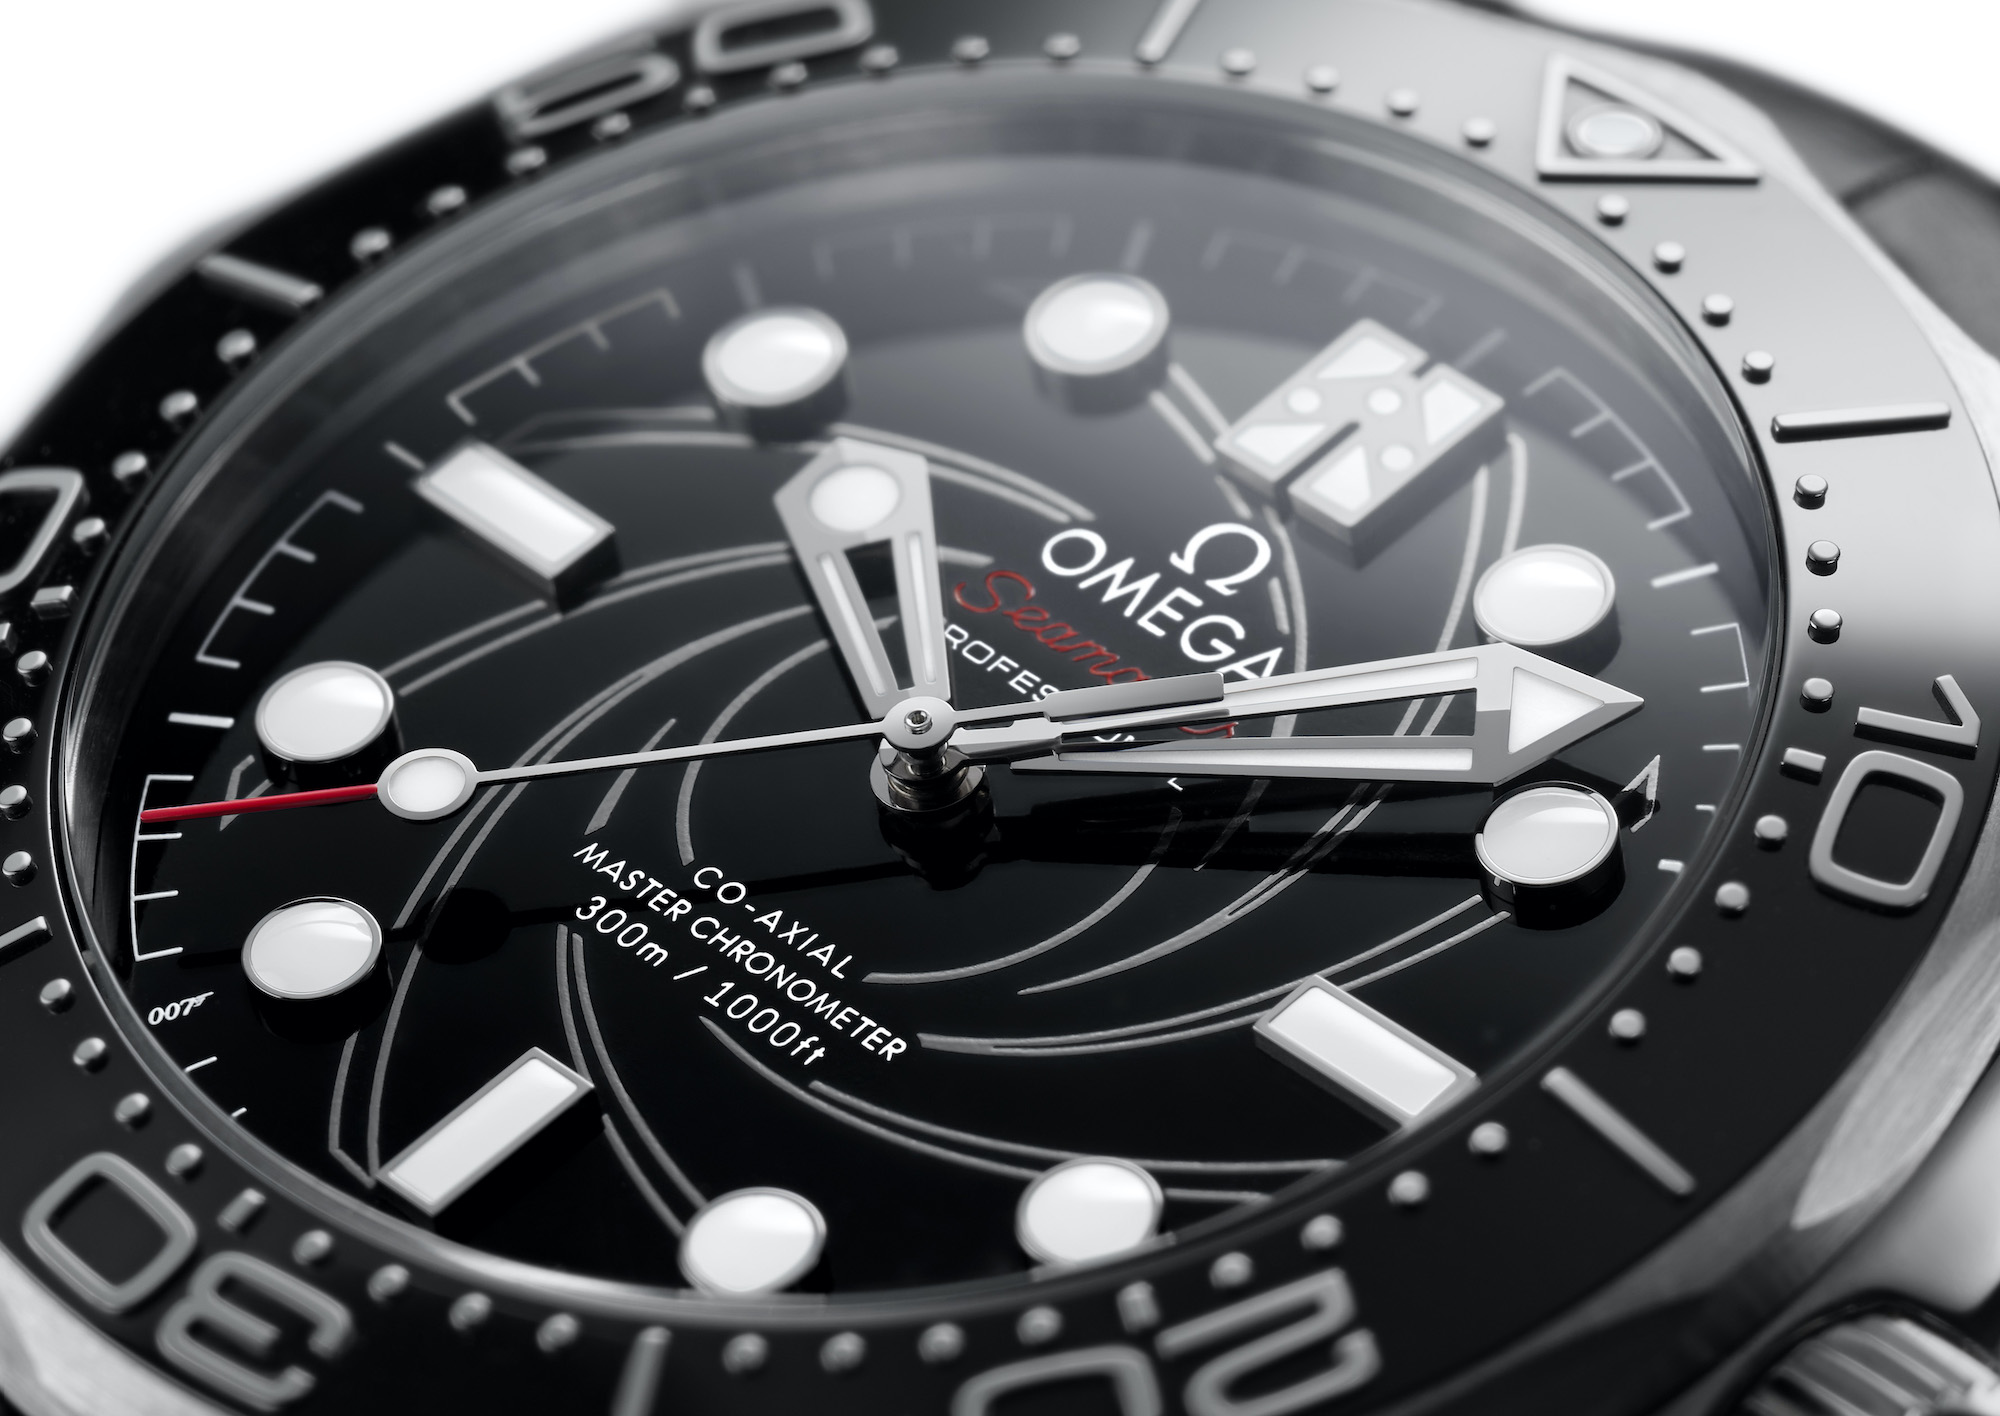 Omega Seamaster Diver 300M James Bond Platino Oro 210.93.42.20.01.001 detalle esfera